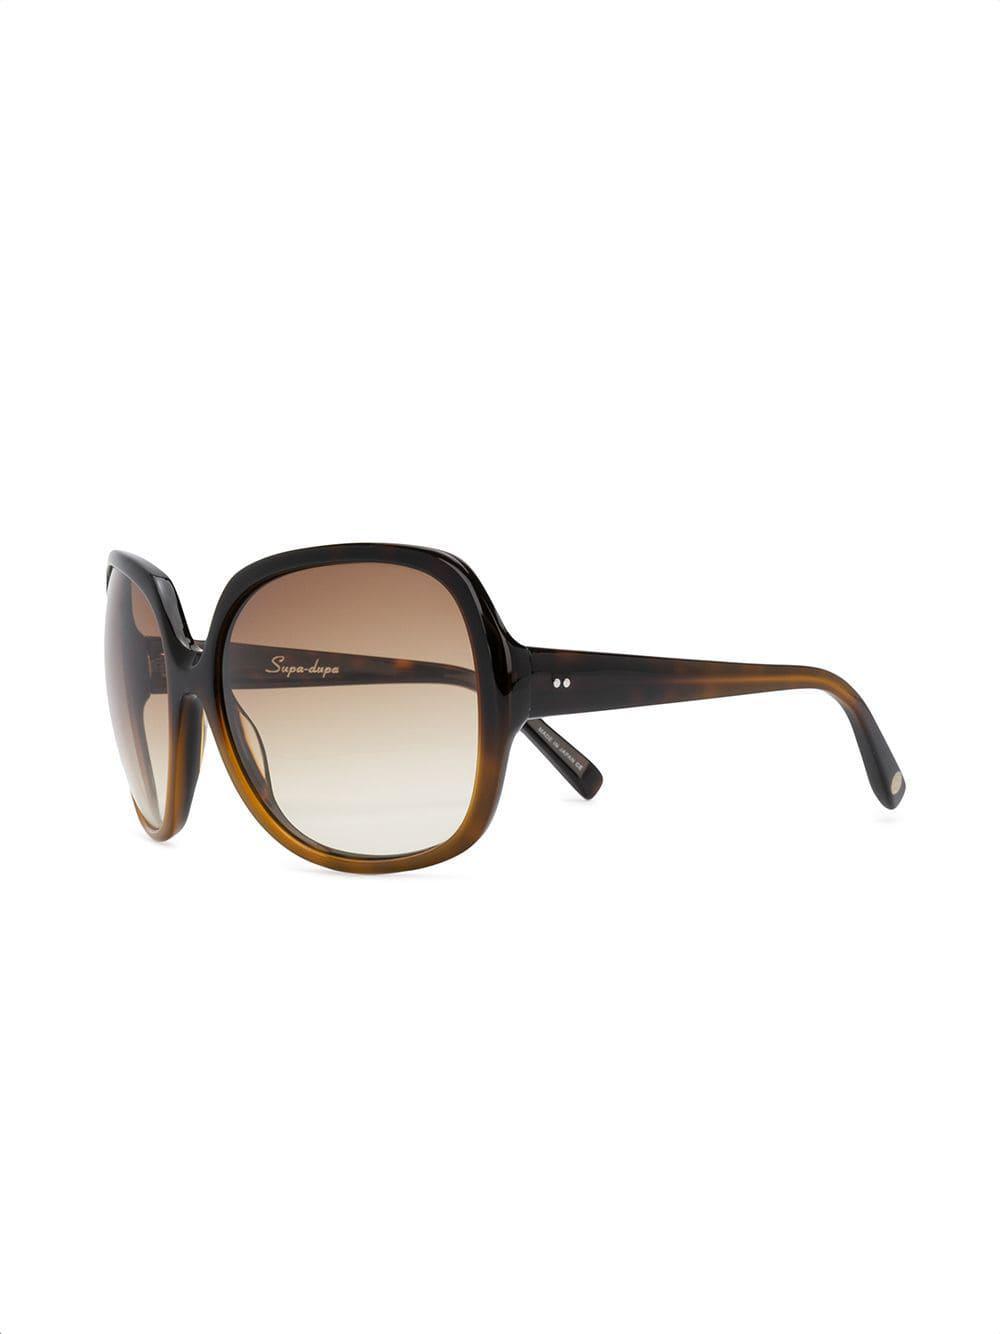 10a52958a4e Dita Eyewear - Brown Square Tinted Sunglasses - Lyst. View fullscreen